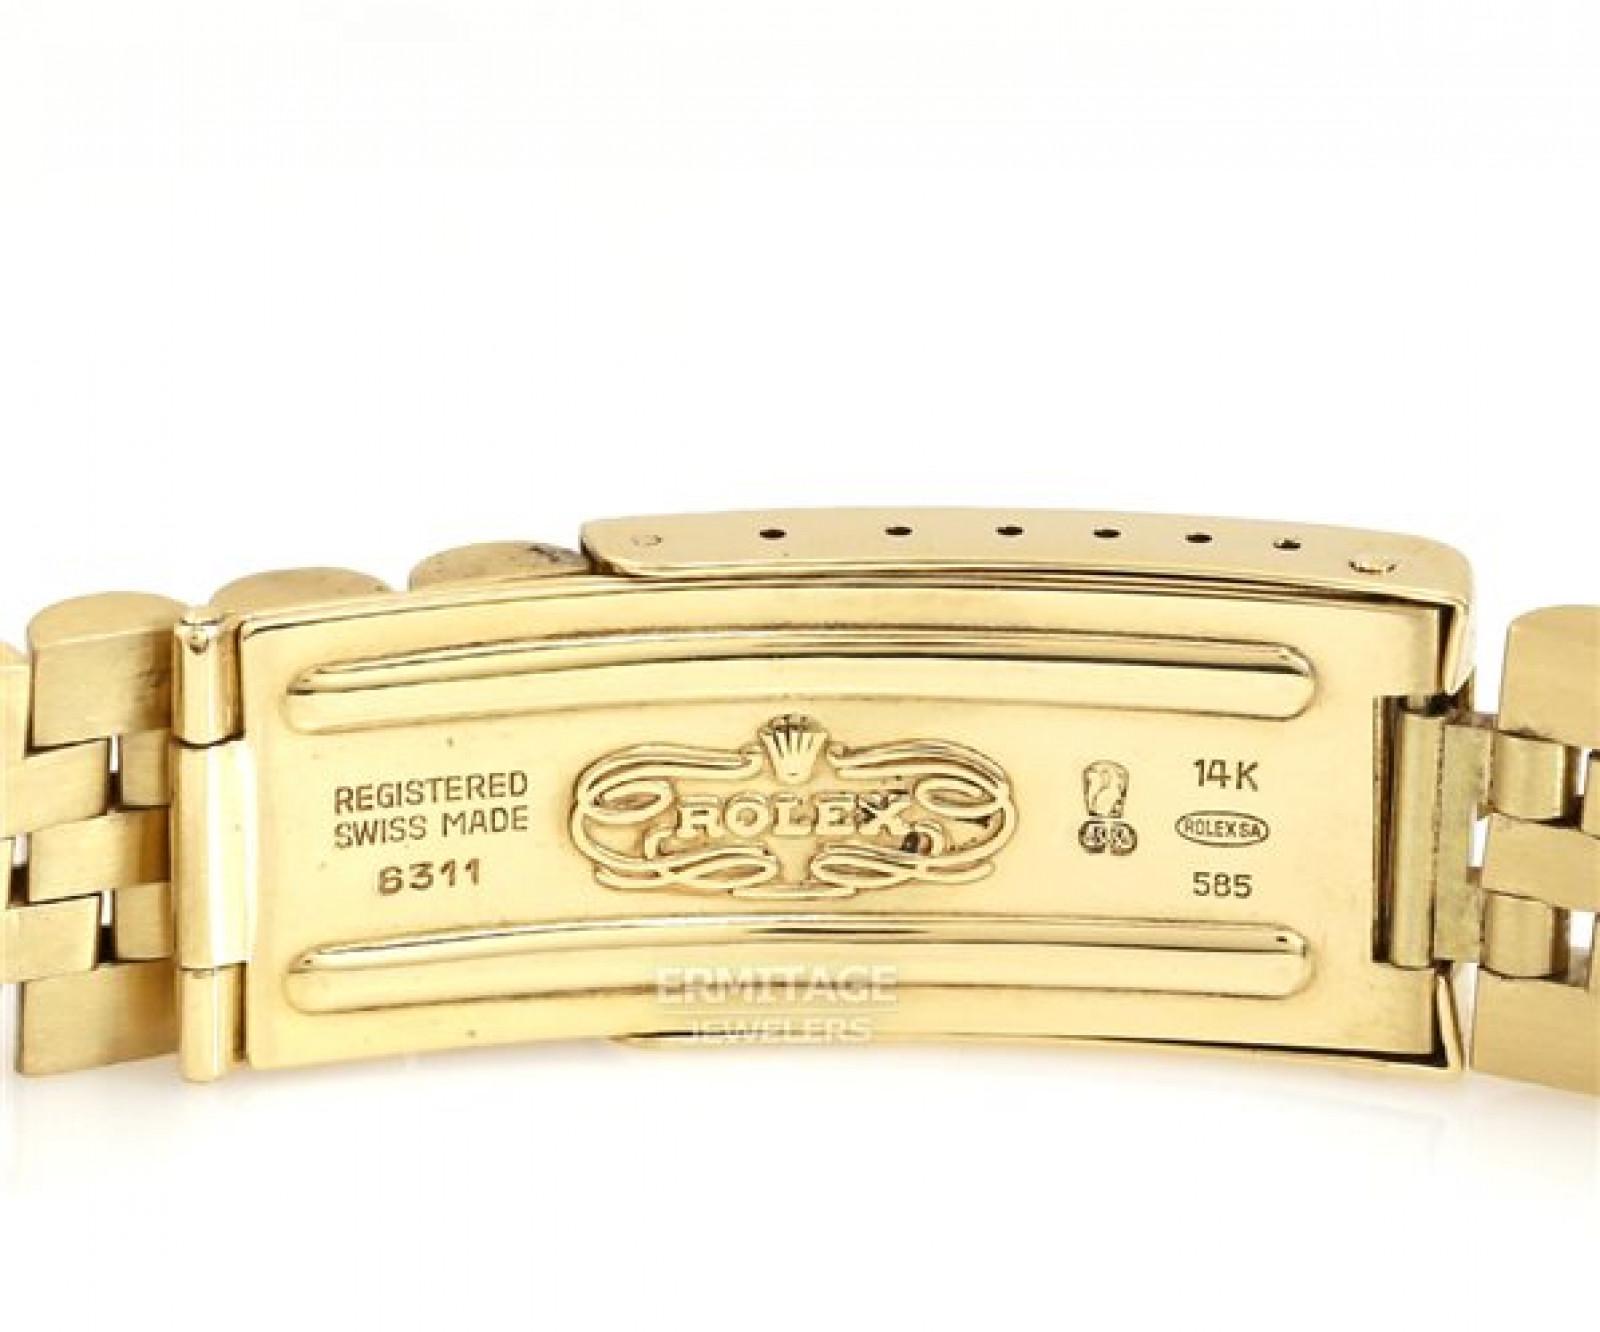 Rolex Date 15037 Gold 104.5 Grams